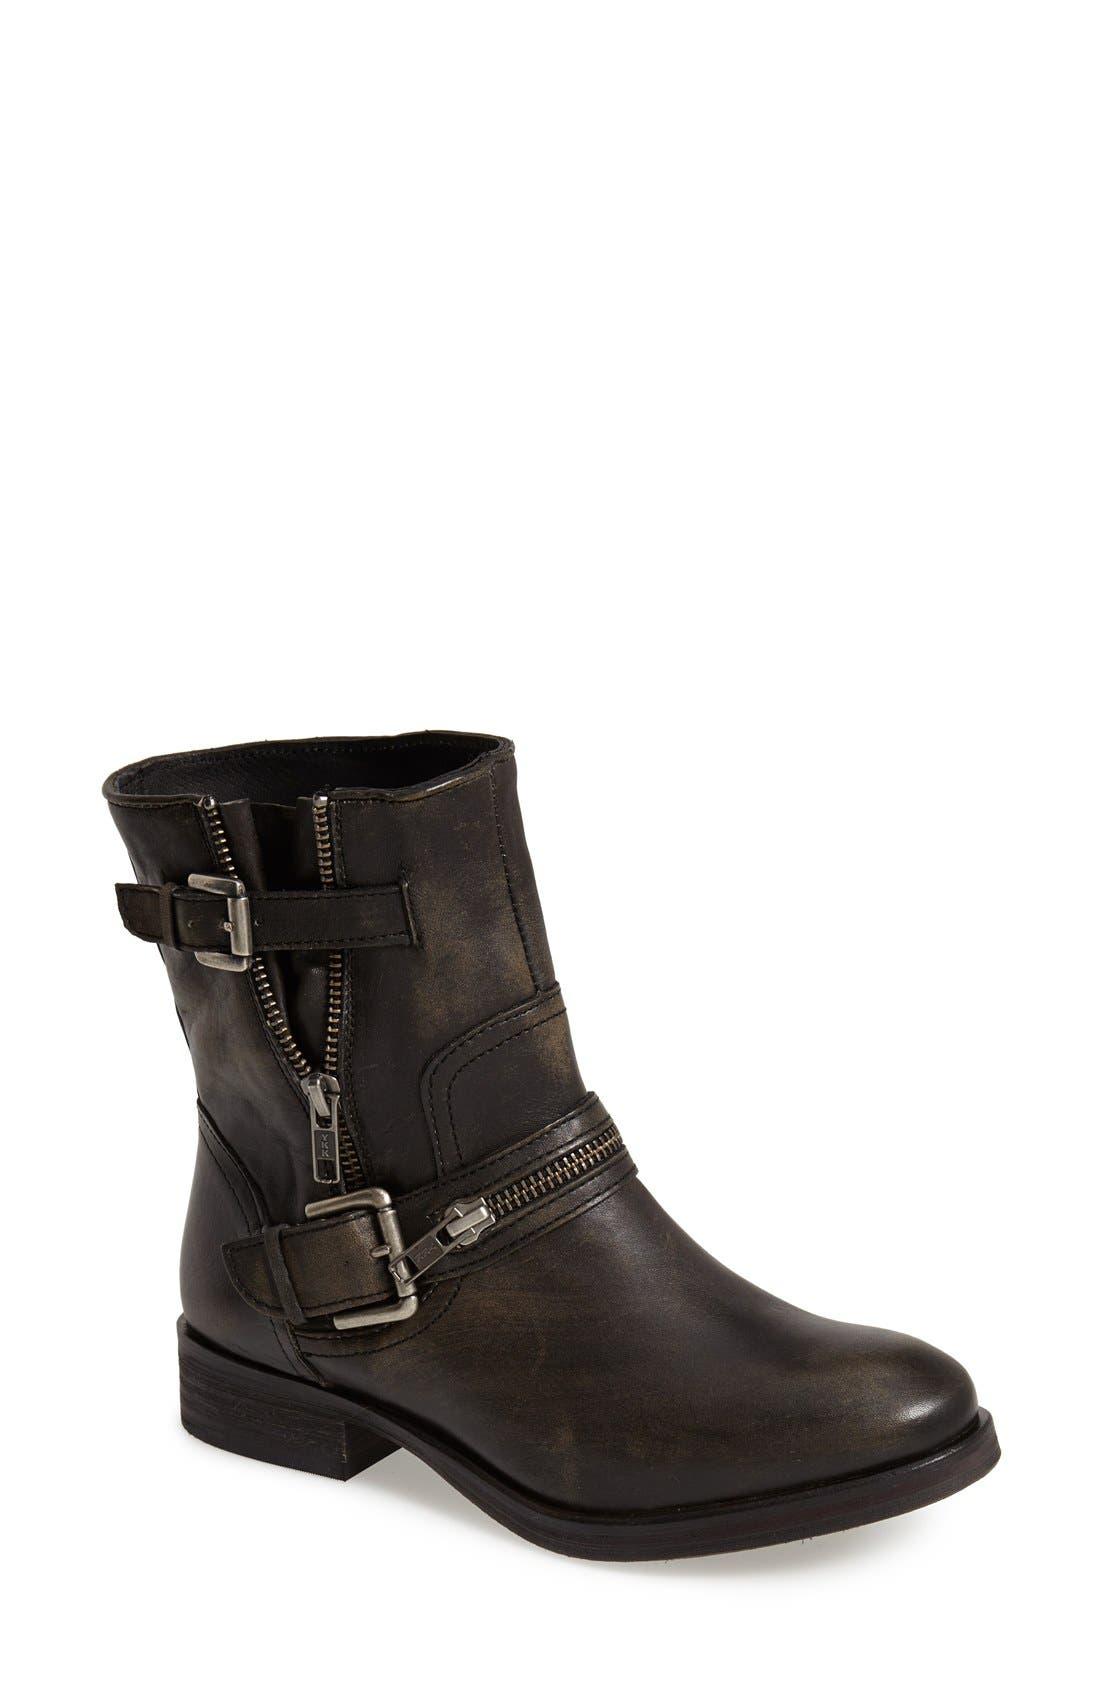 Main Image - Hinge 'Compadre' Leather Moto Boot (Women)